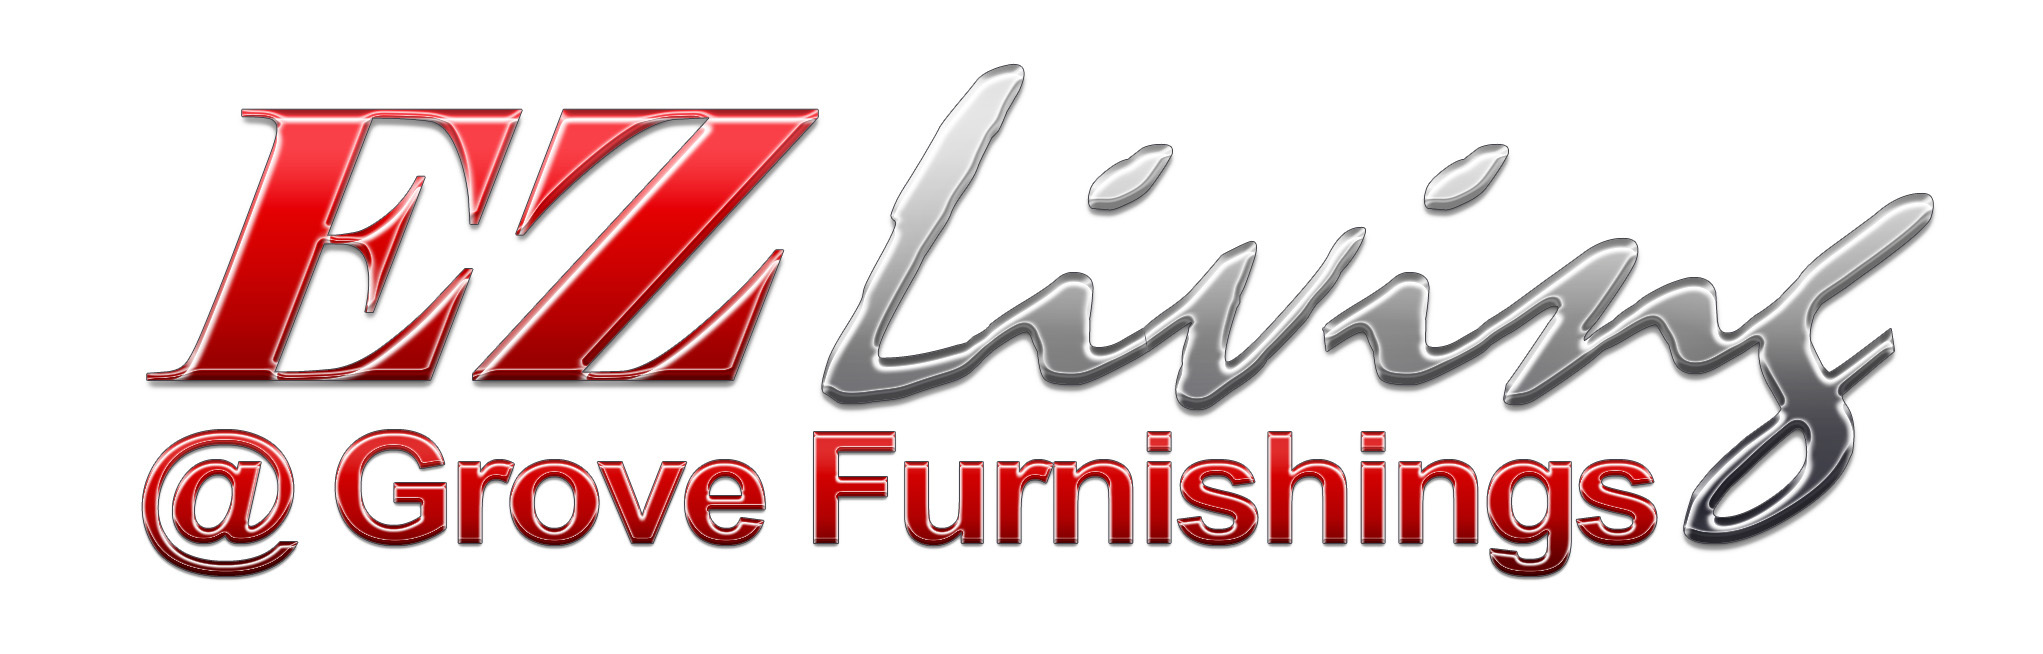 EZ Living @ Grove Furnishings Logo